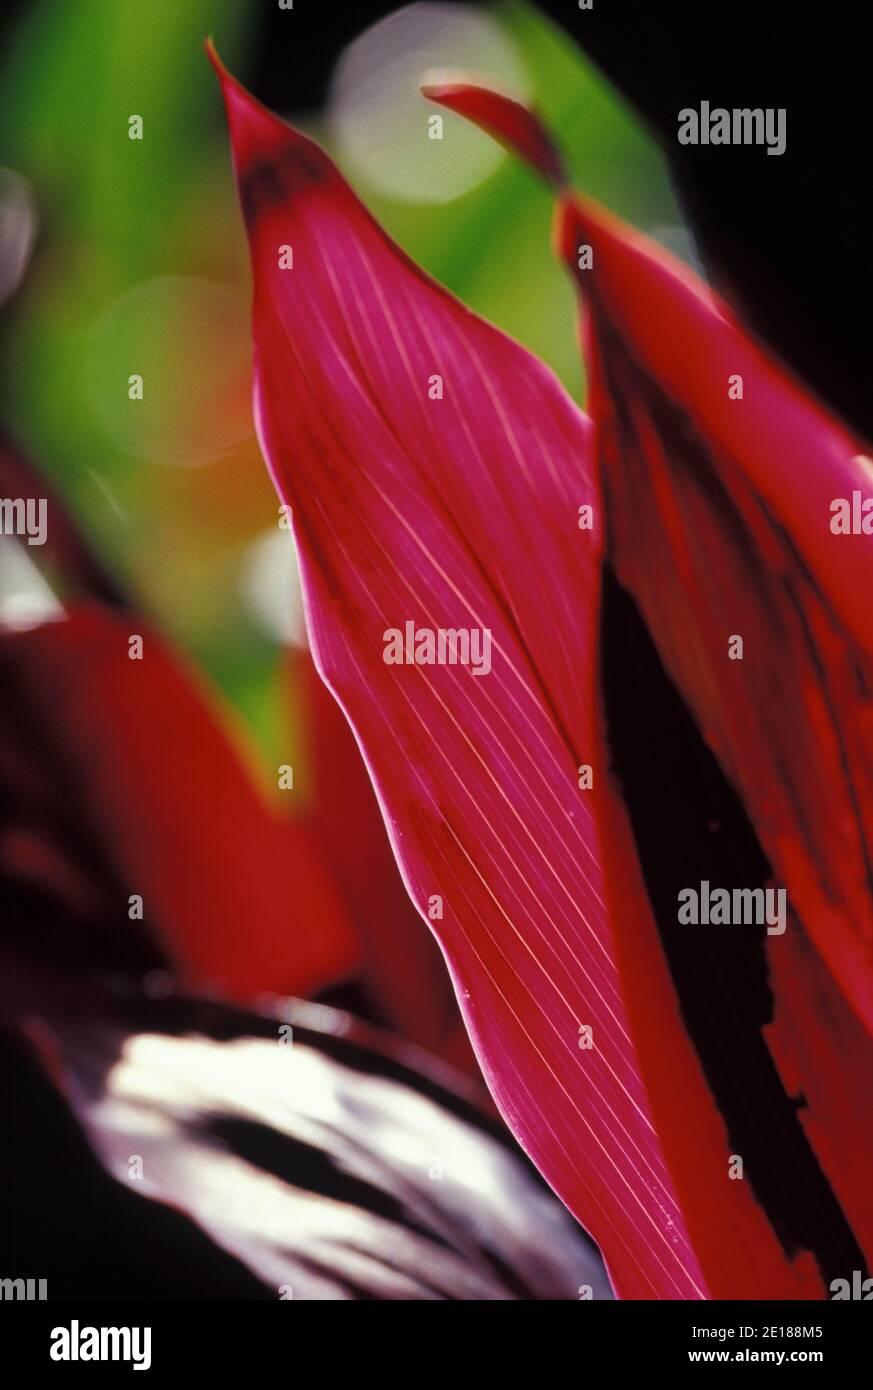 Red ti leaf closeup, backlit by sun Foto de stock